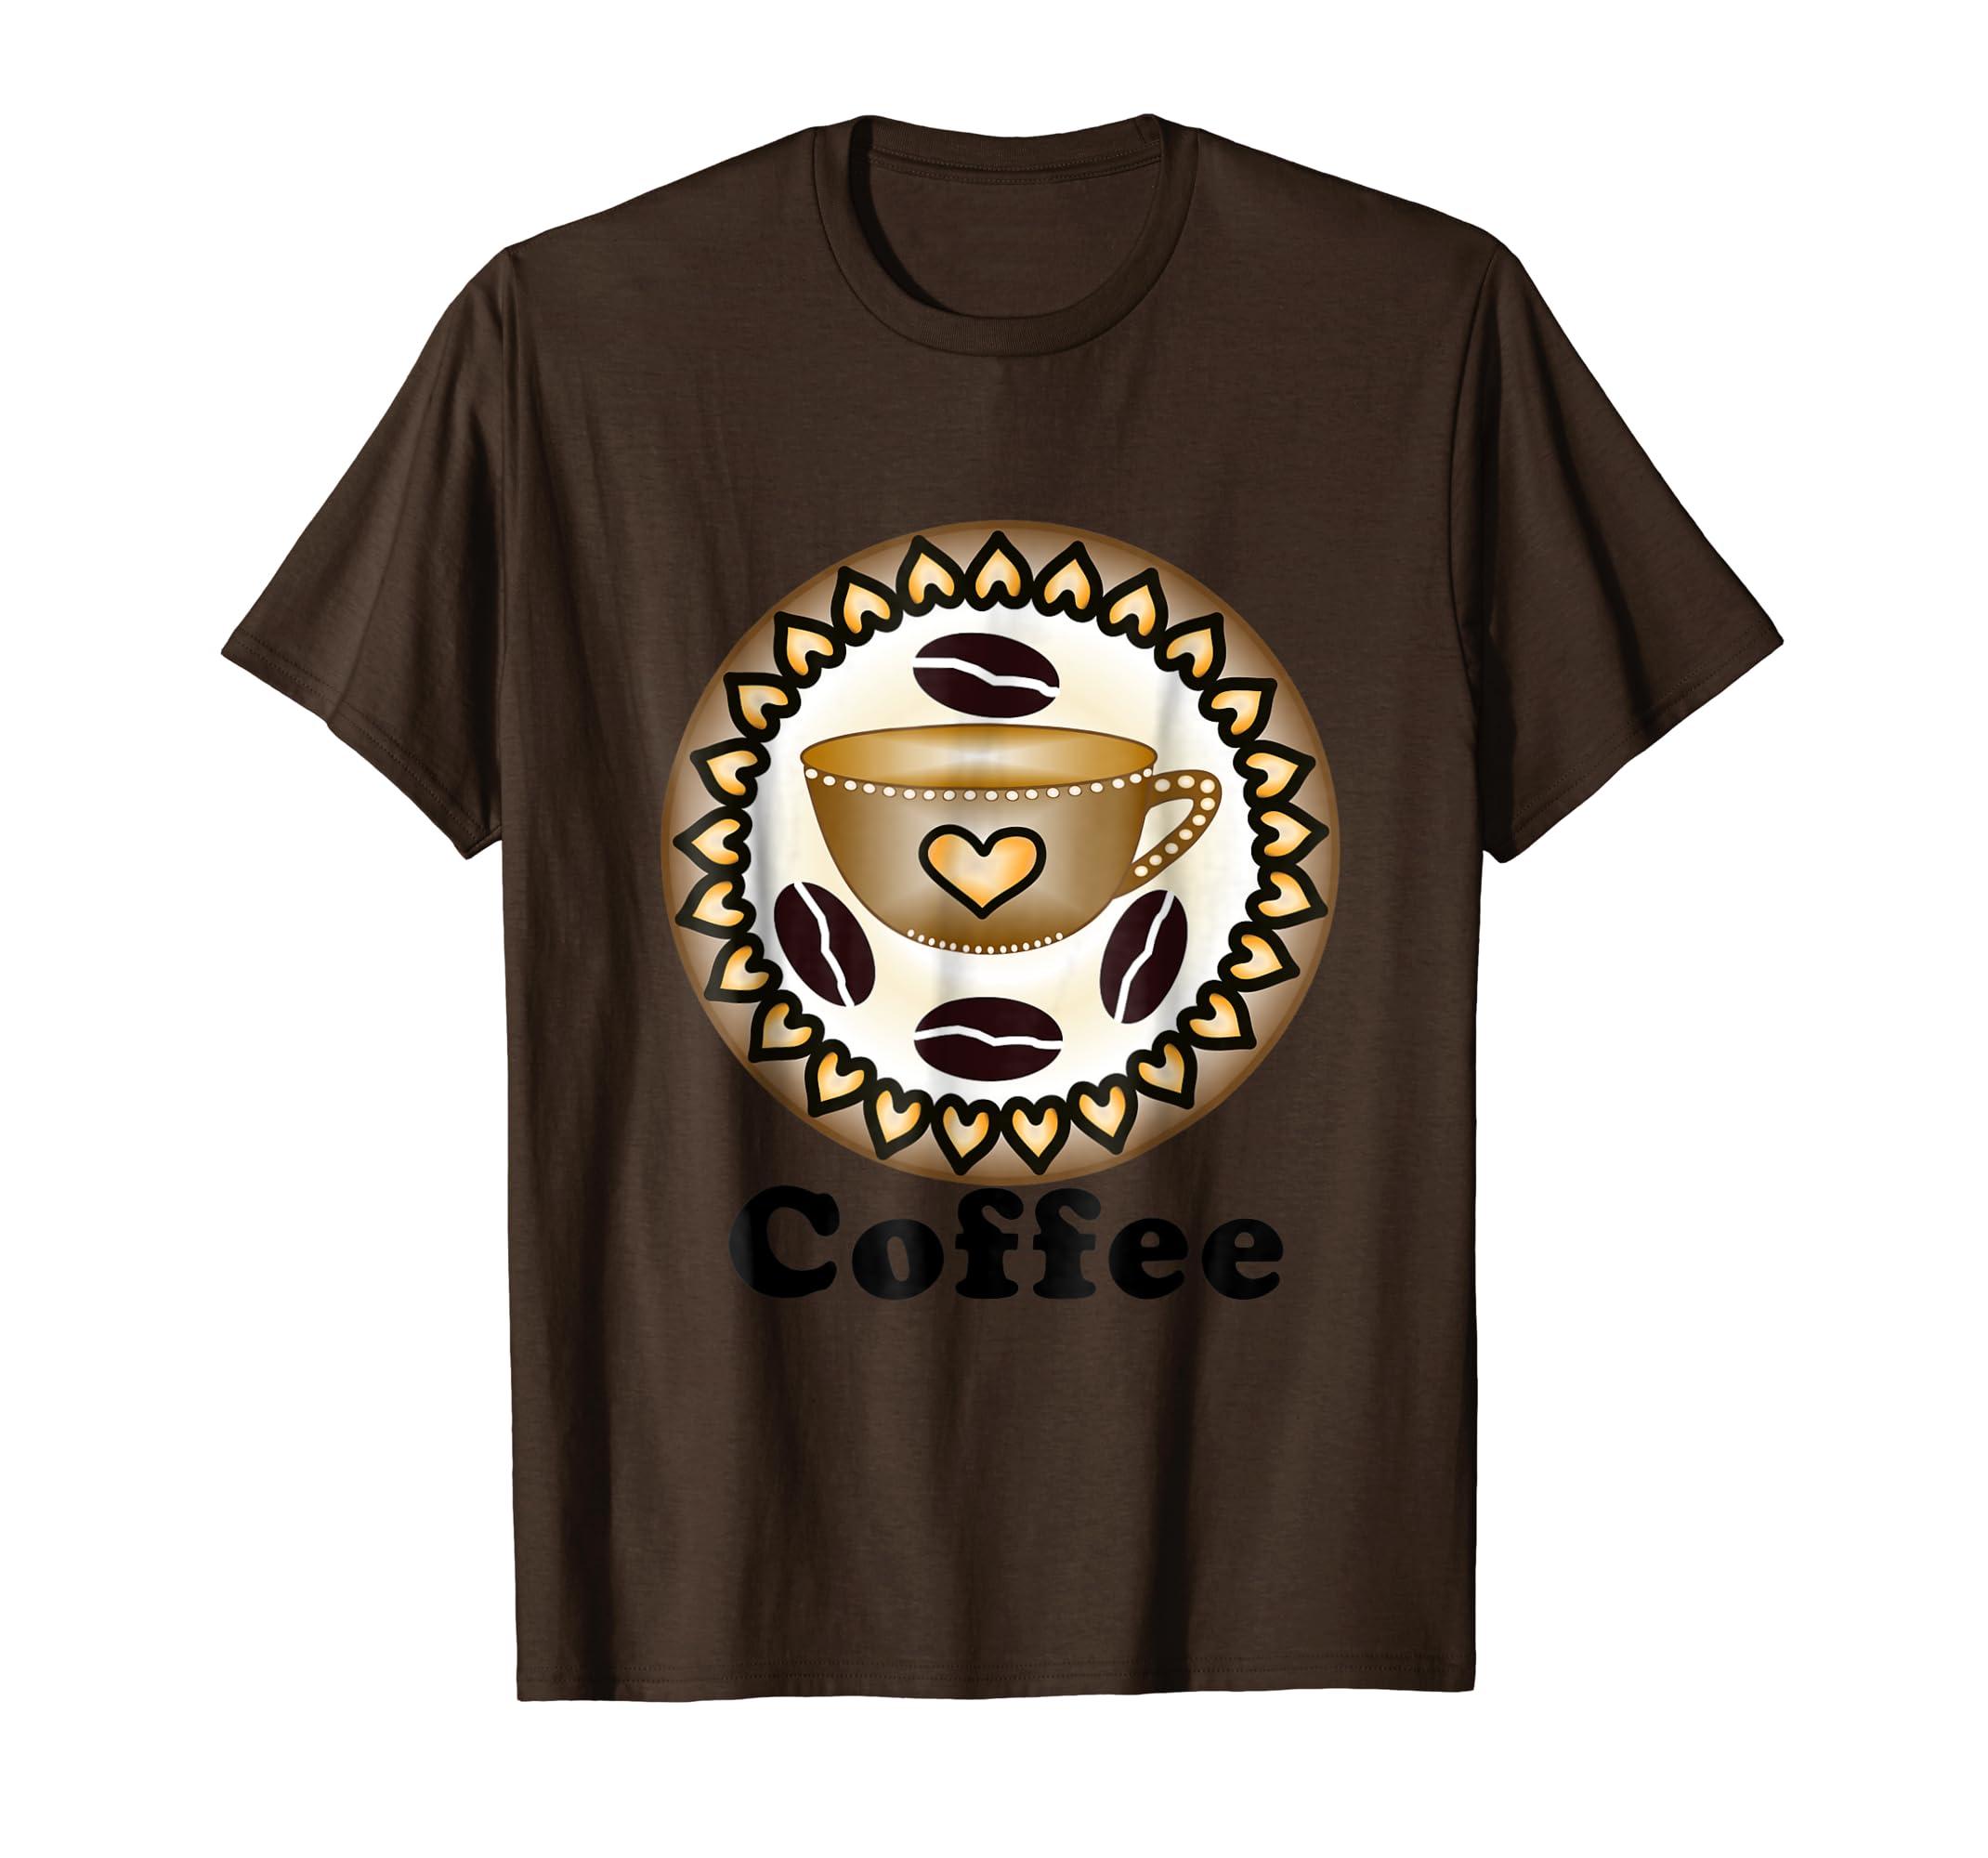 Amazon.com: Coffee Lover, Fun Yoga T shirt: Clothing